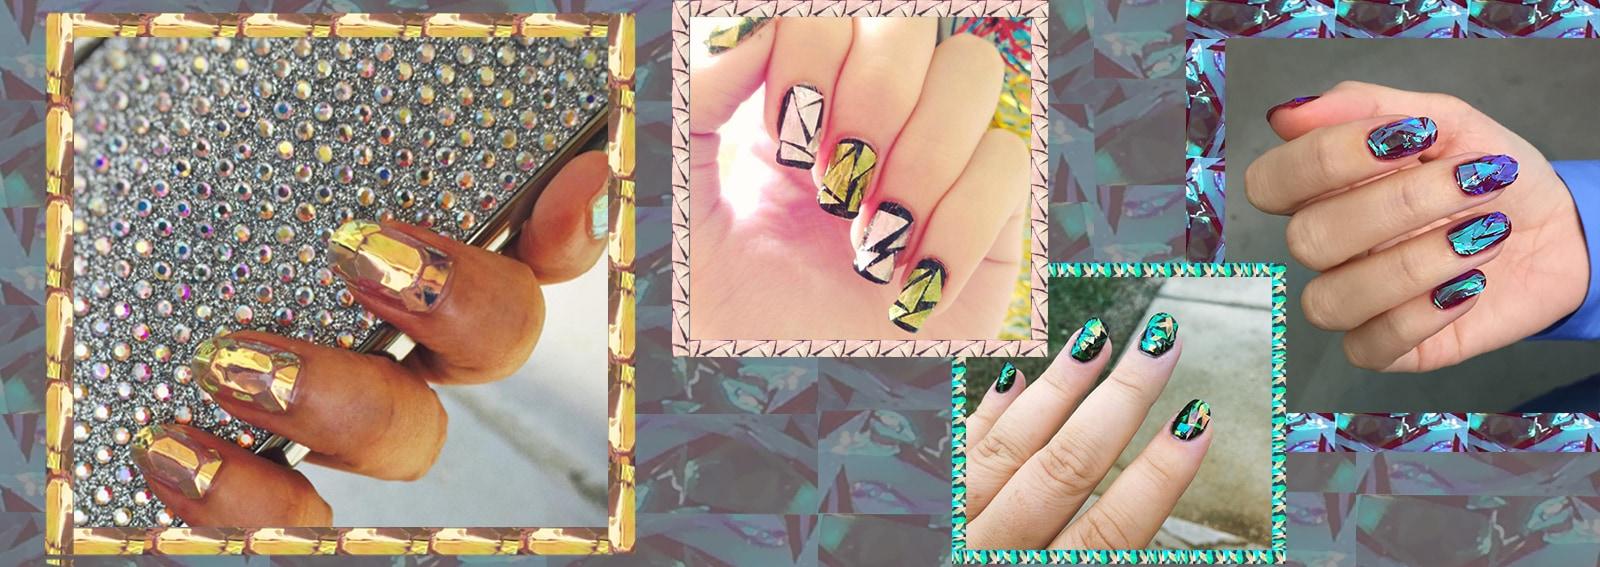 cover-shattered-nails-la-nuova-nail-desktop